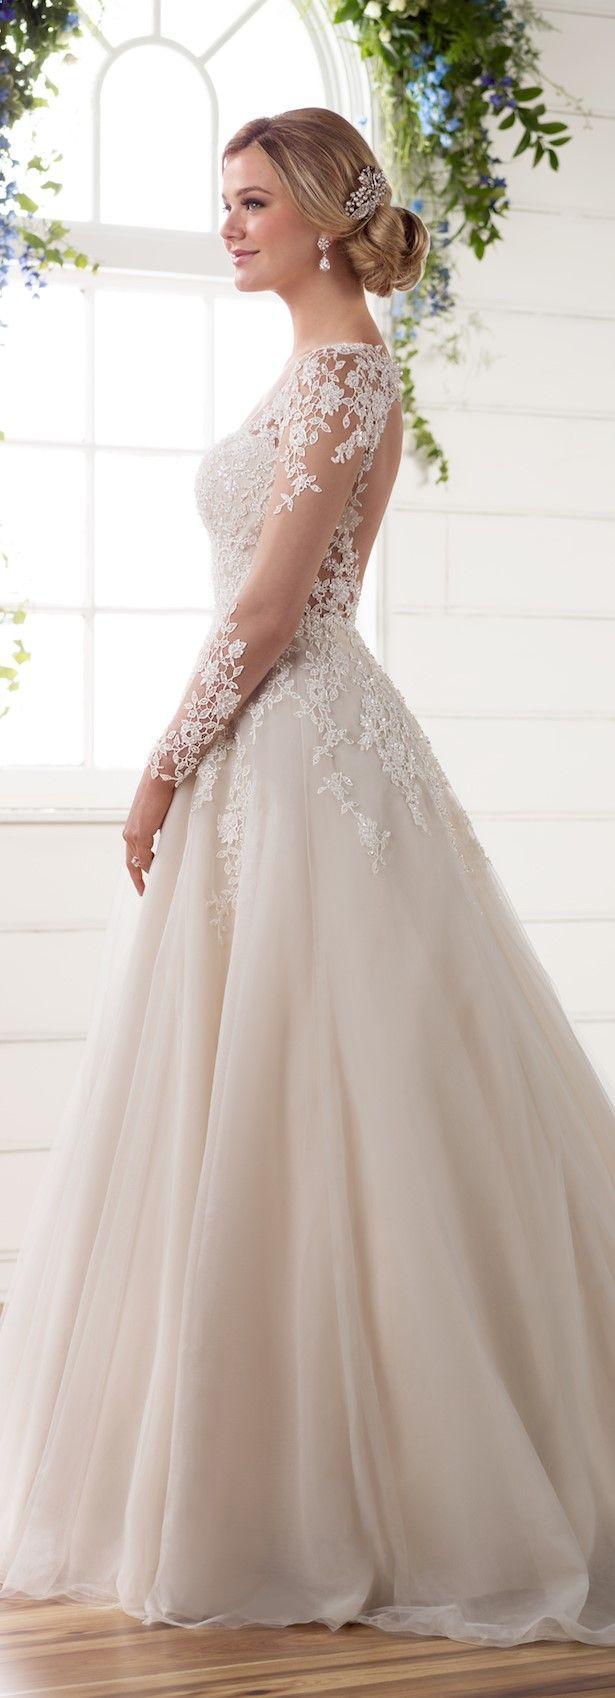 Wedding dress by essense of australia spring bridal collection